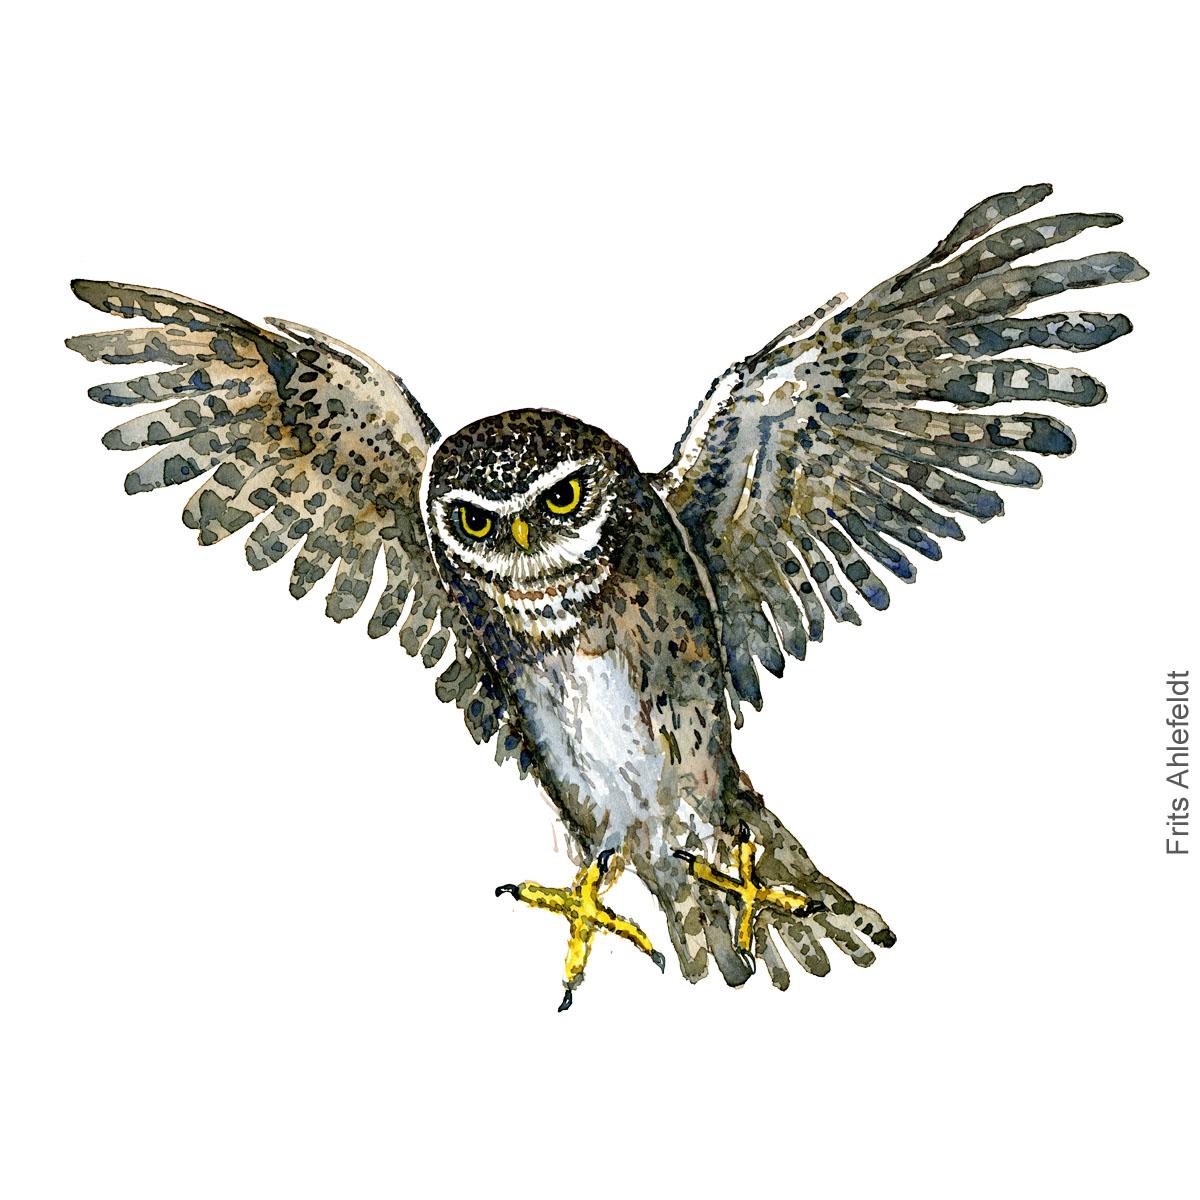 Kirkeugle - Little owl - Bird watercolor painting. Artwork by Frits Ahlefeldt. Fugle akvarel